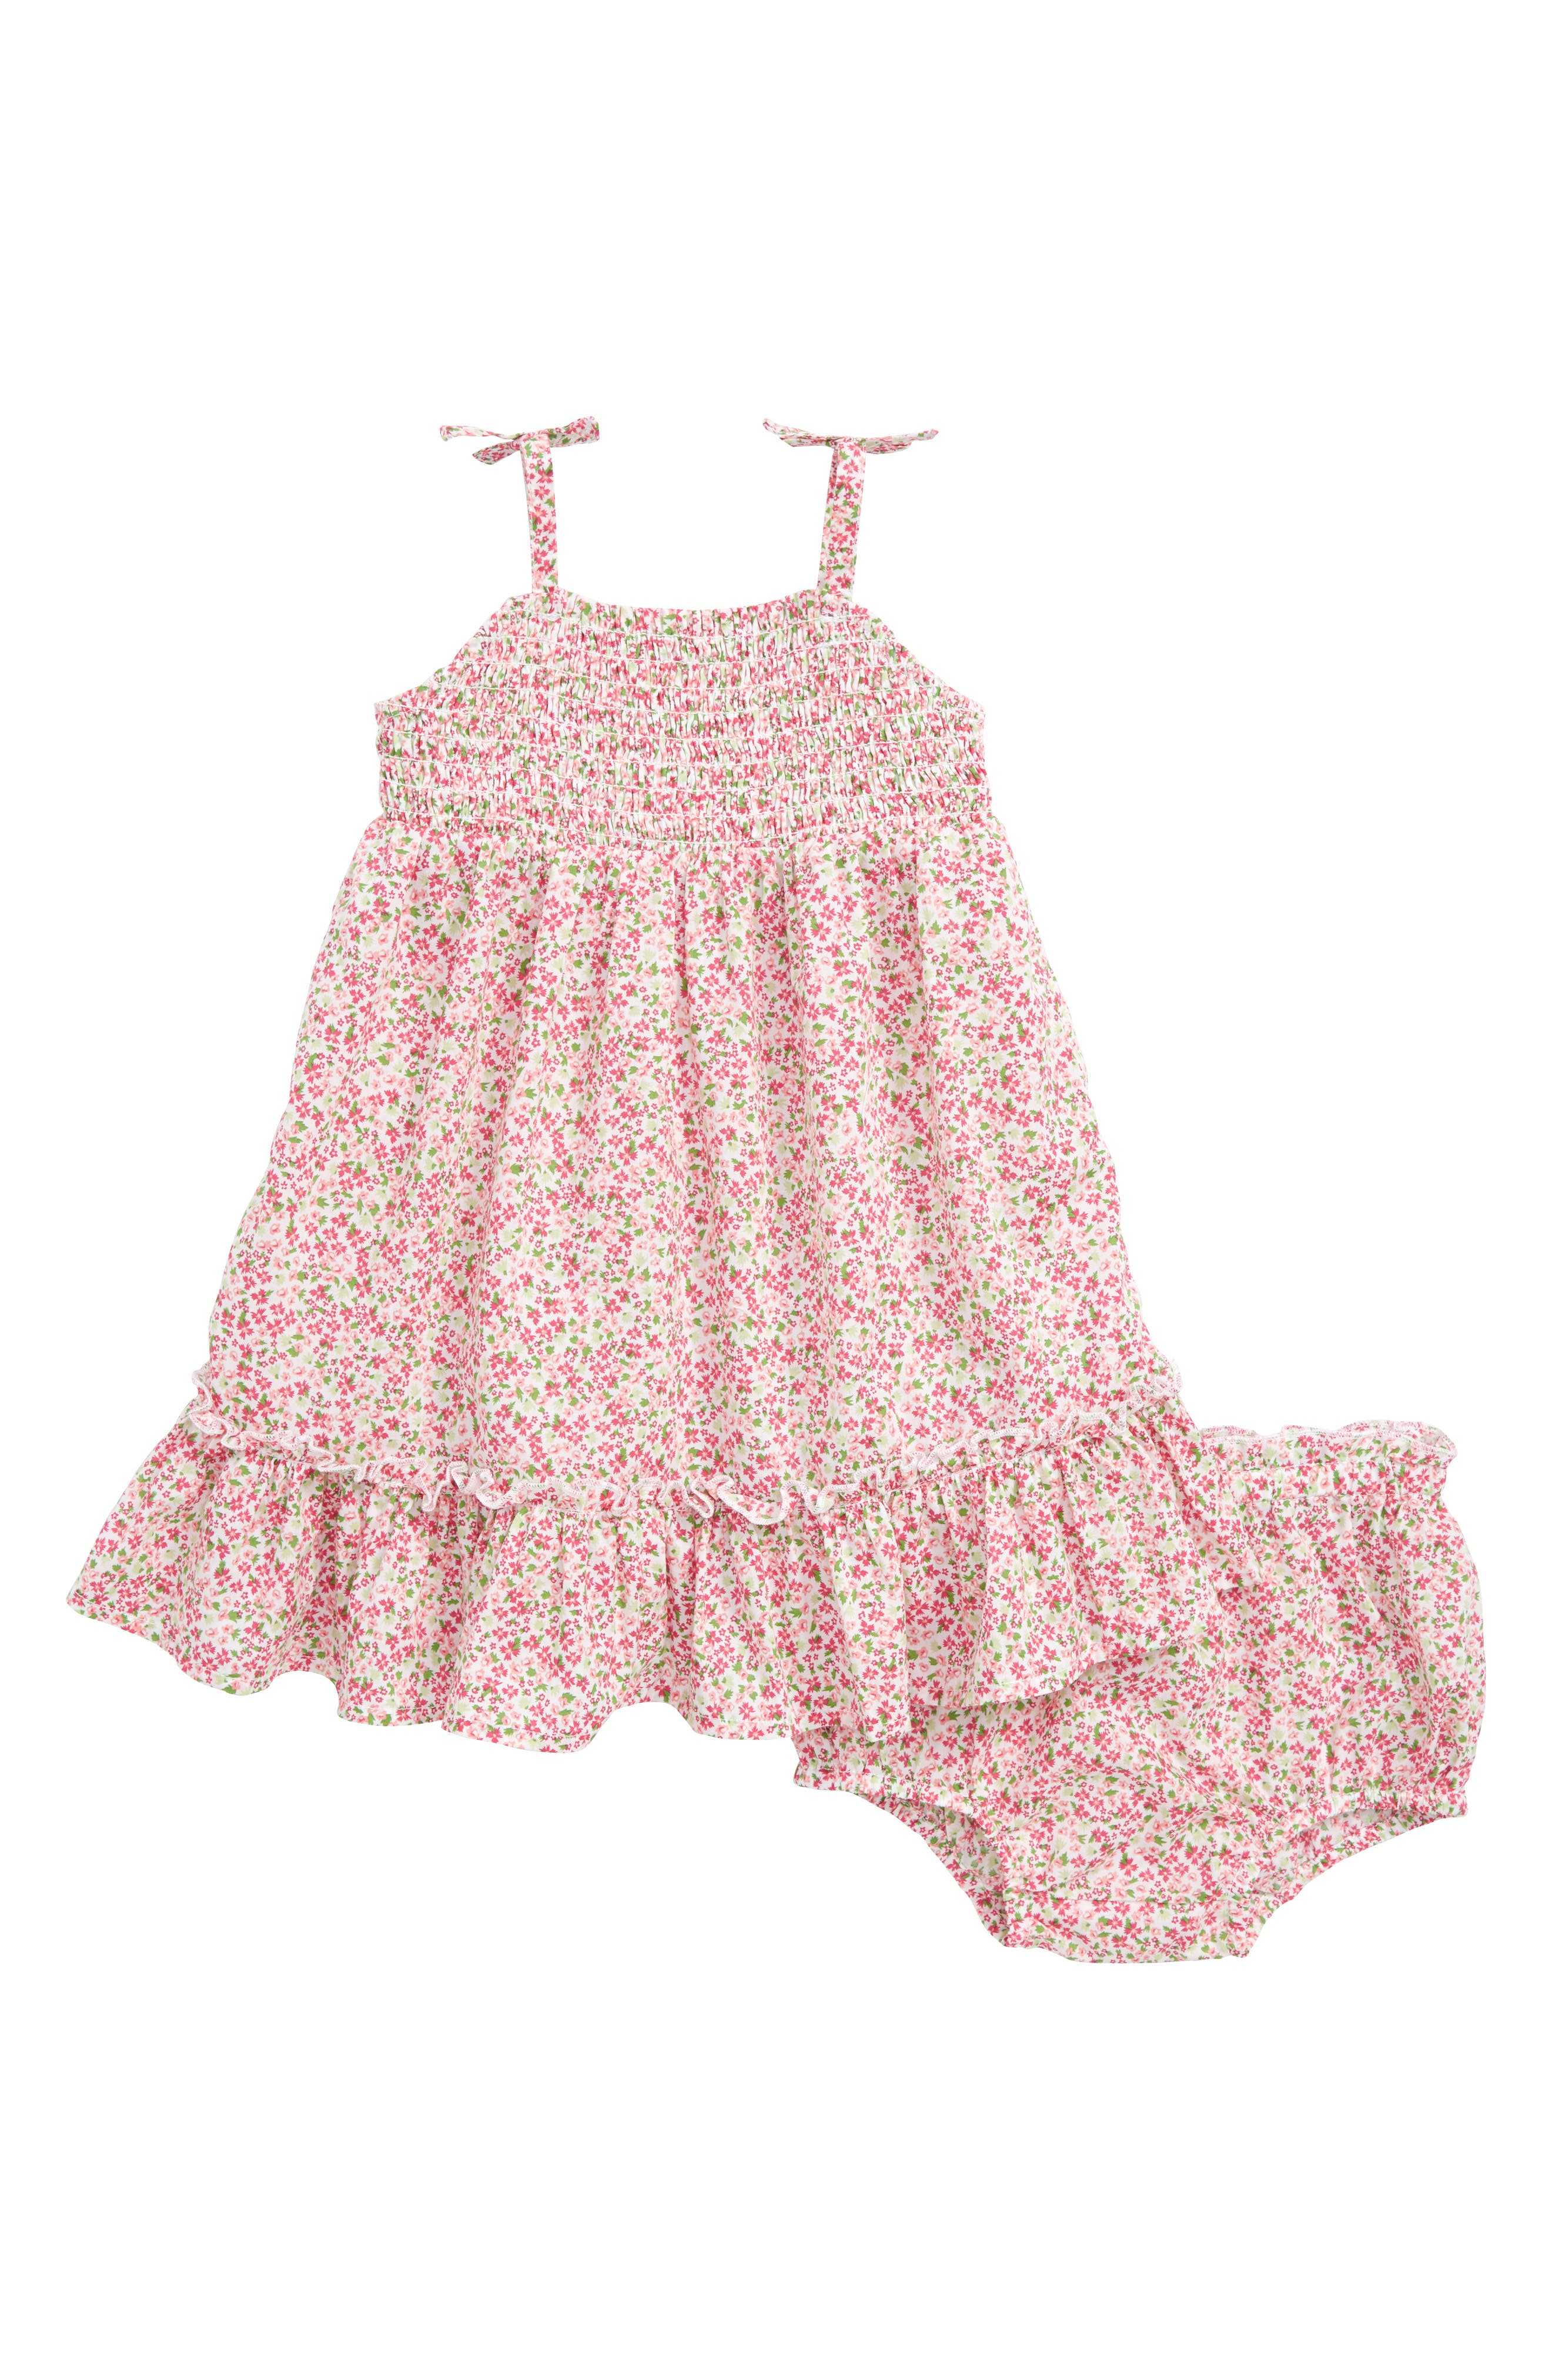 Ditzy Smock Dress,                             Main thumbnail 1, color,                             White- Pink Dense Floral